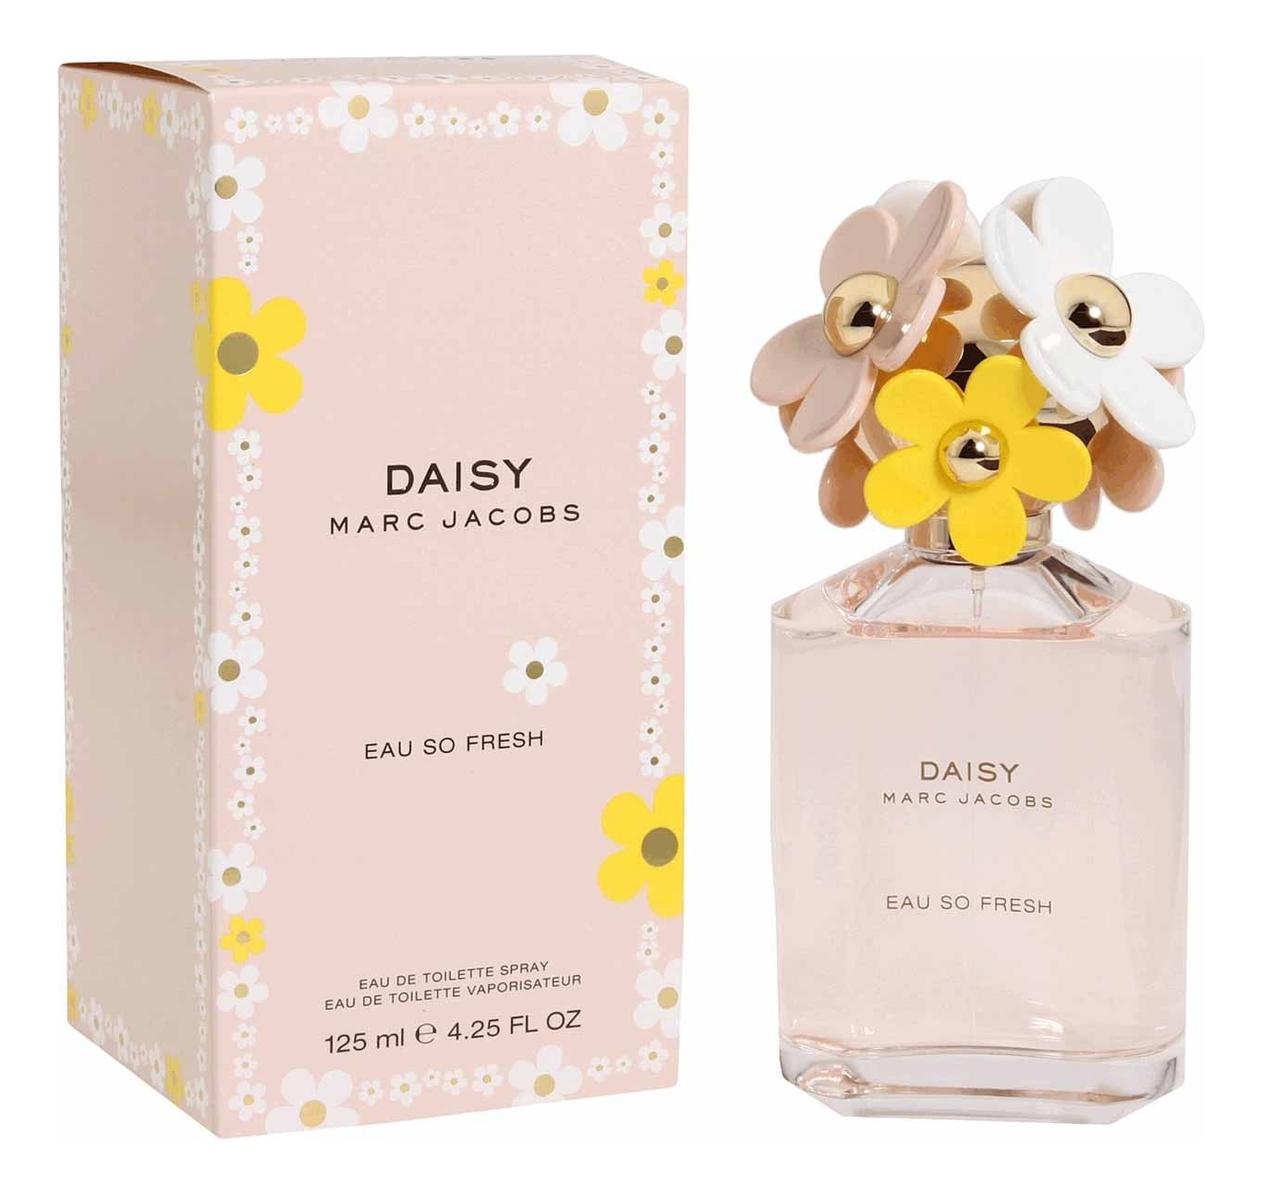 Купить Daisy Eau So Fresh: туалетная вода 125мл, Marc Jacobs